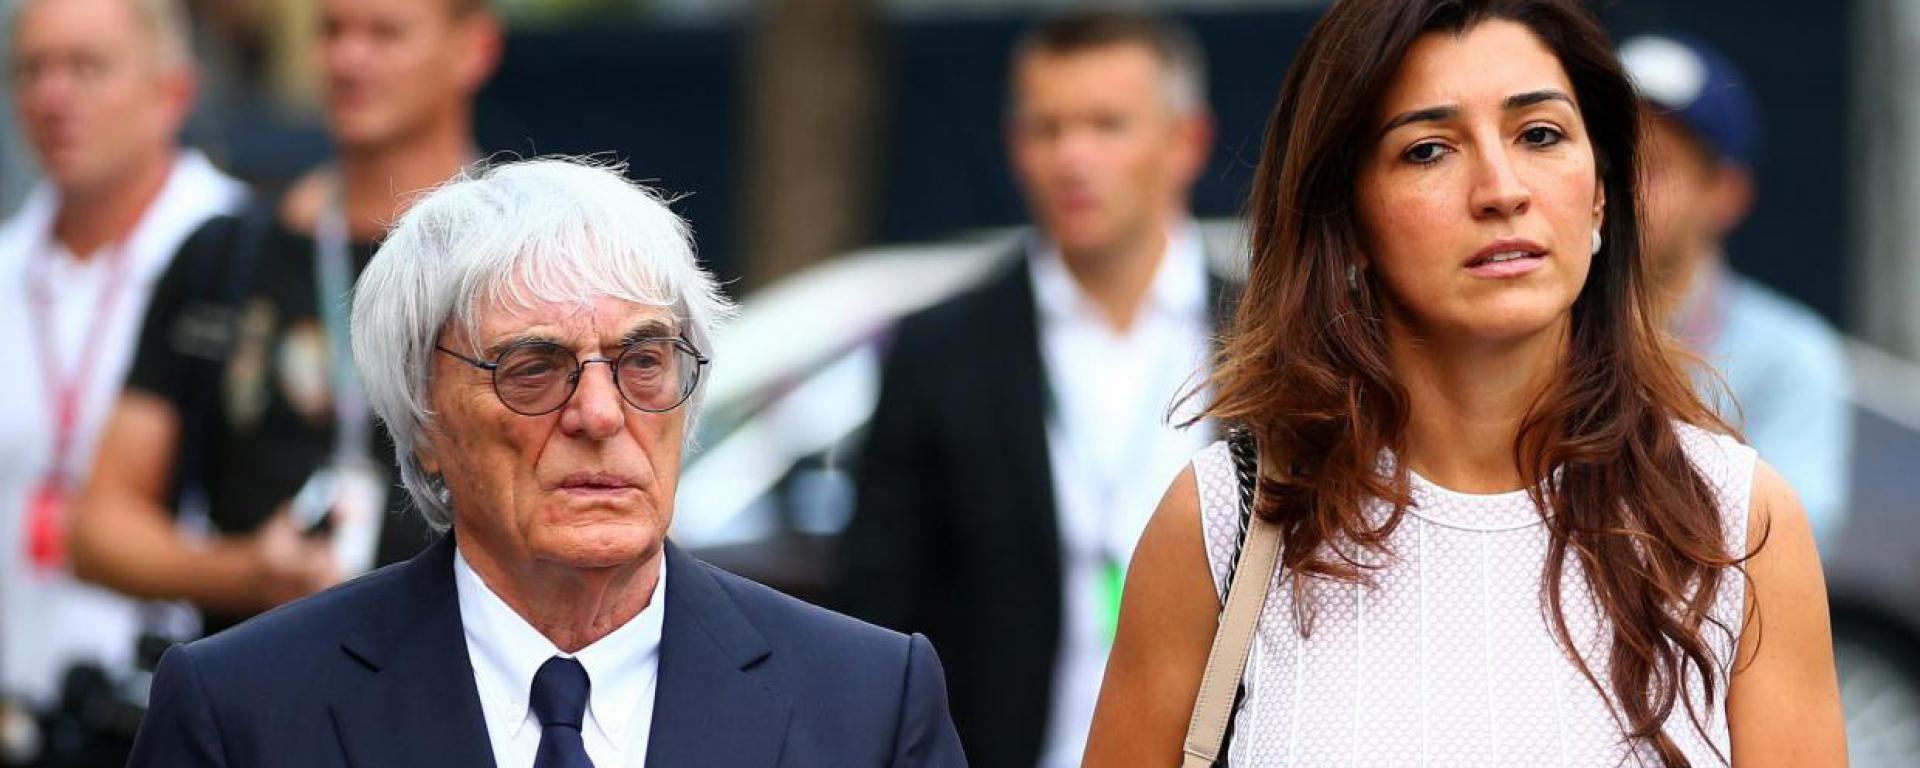 Bernie Ecclestone, madre Fabiana Flosi liberata